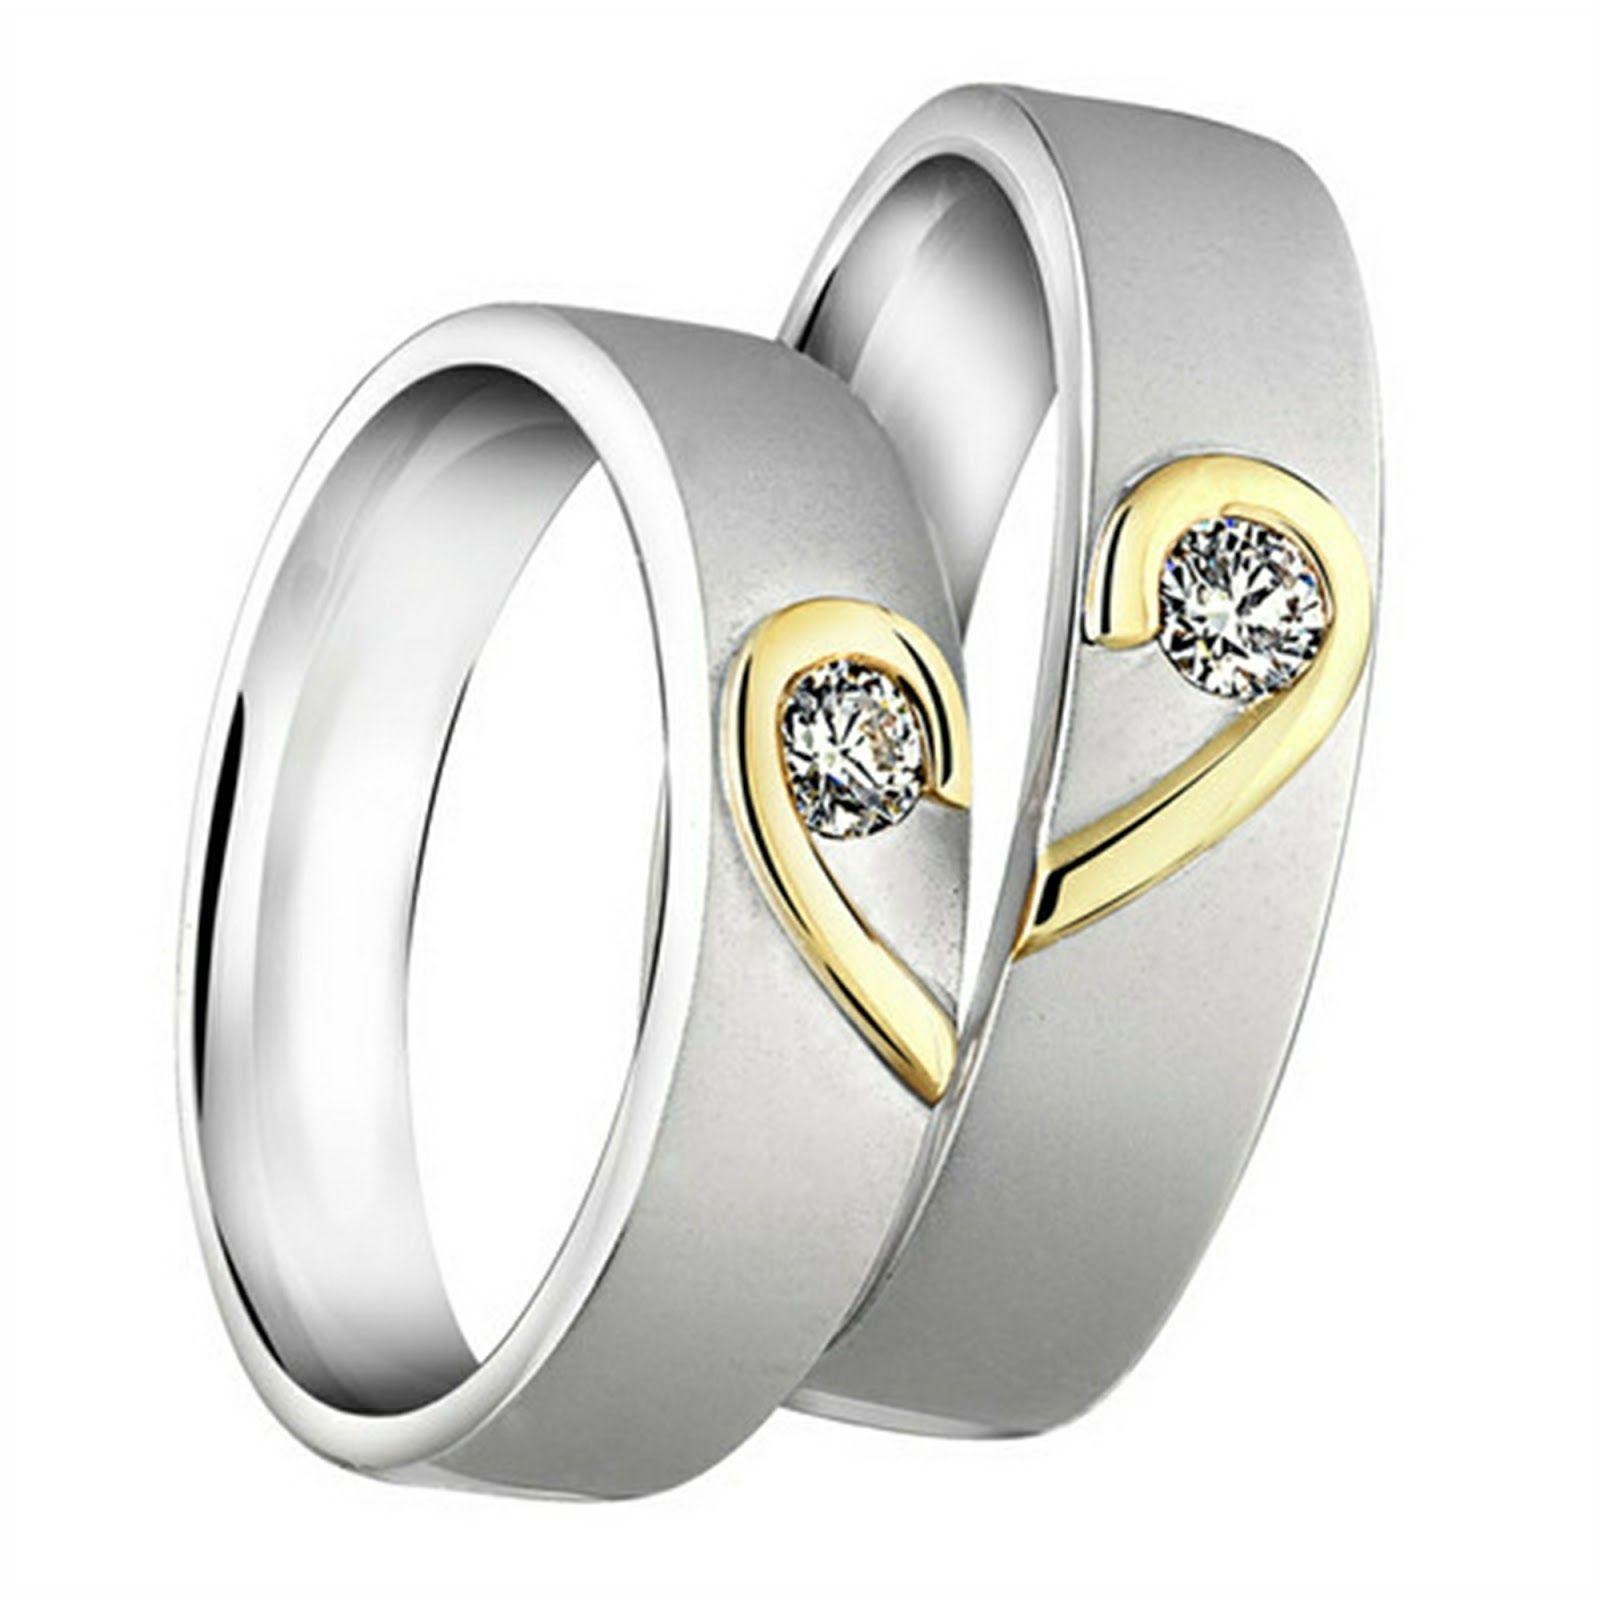 Gambar Cincin Tunangan Untuk Calon Pengantin Selingkaran Com Rings Wedding Rings Gold Ring Designs